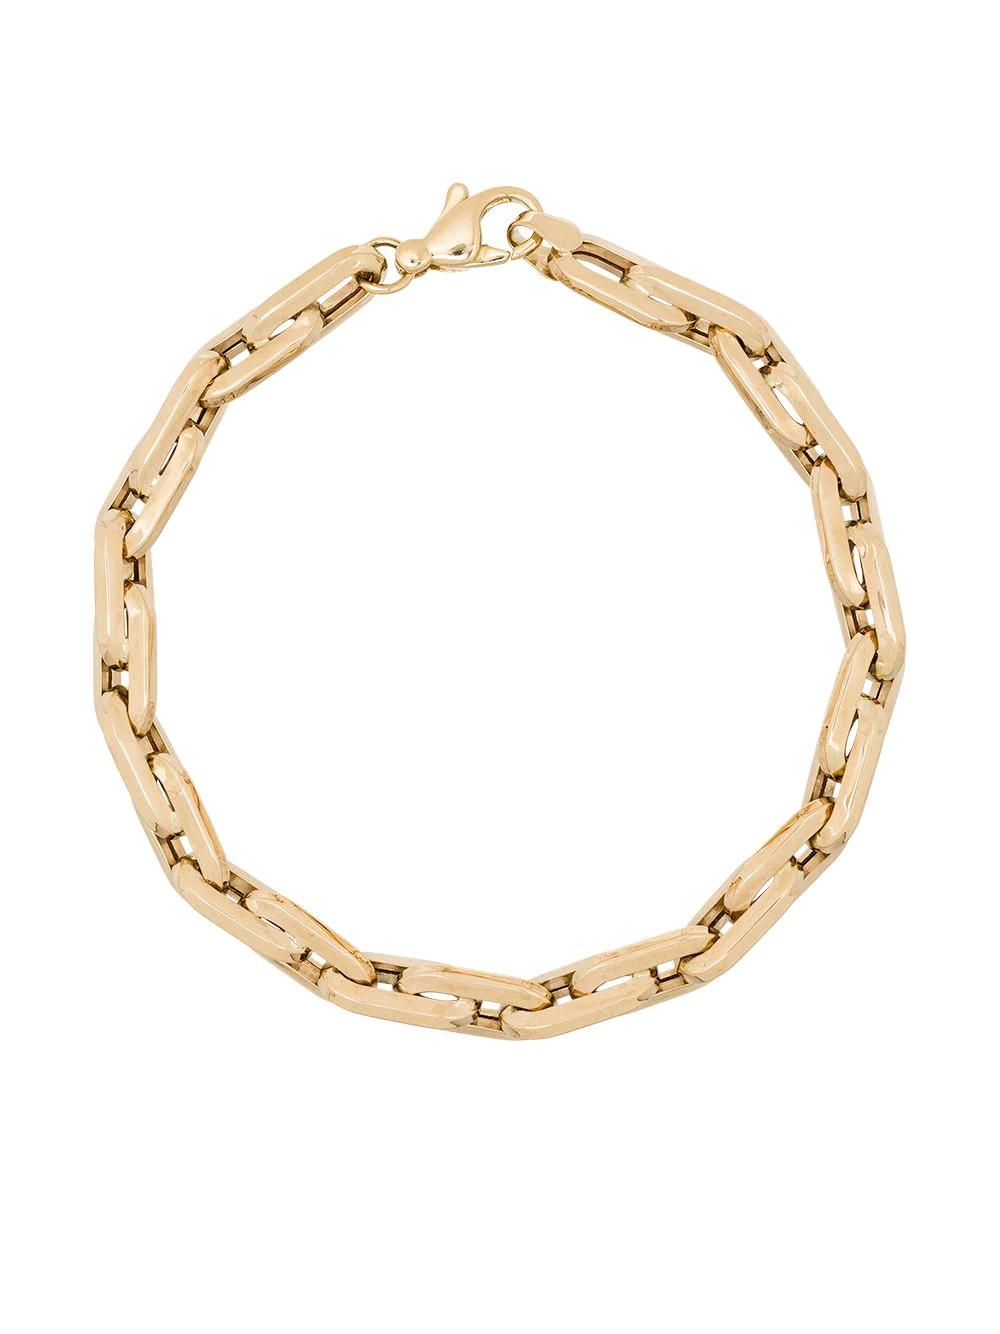 Adina Reyter | Adina Reyter браслет из желтого золота | Clouty